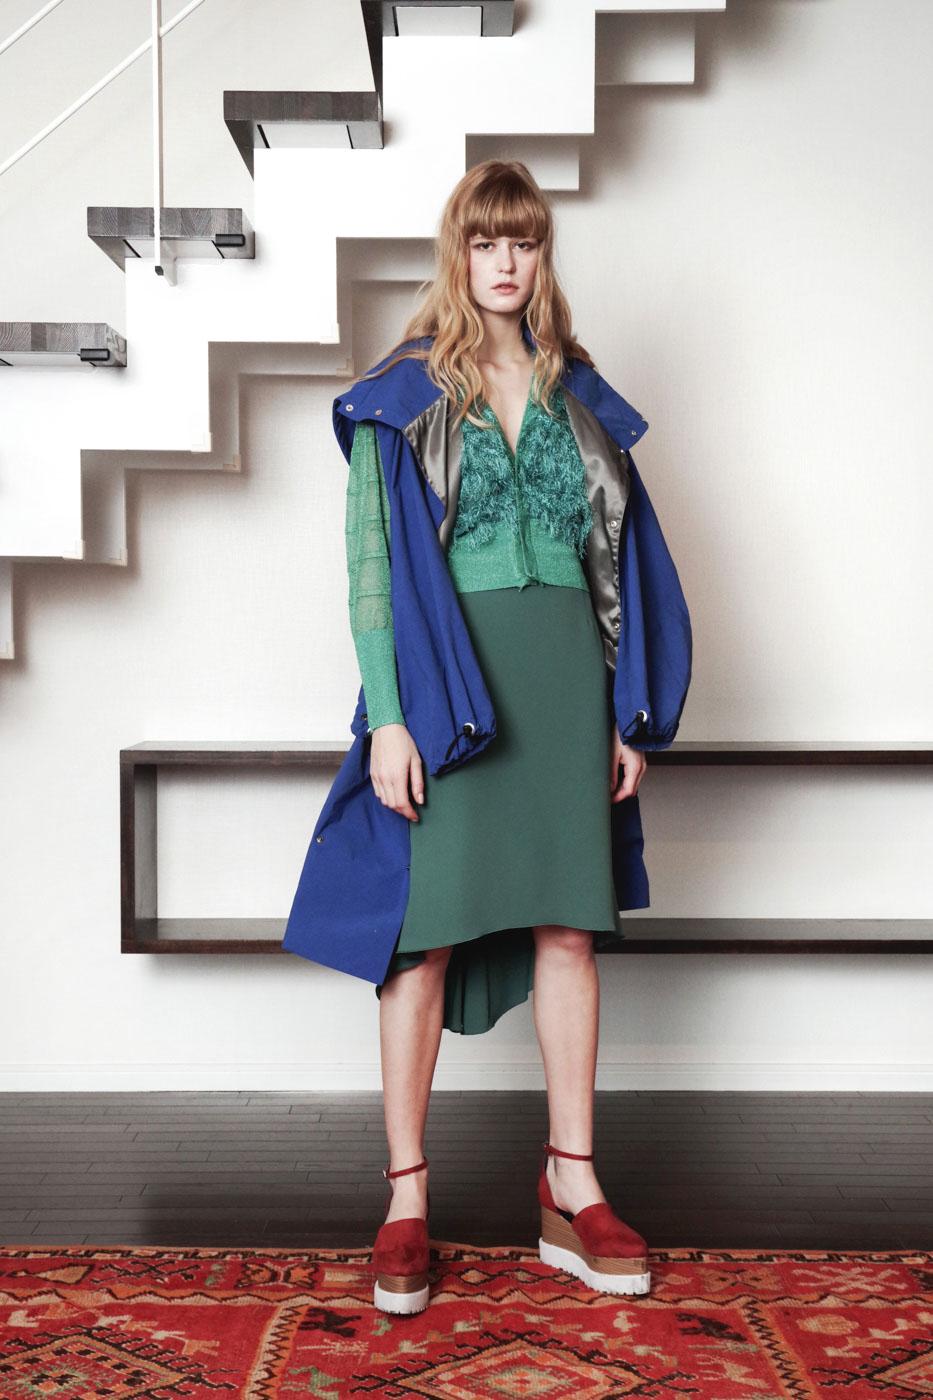 19017 Blouson ¥48,000, 19033 Cardigan ¥24,000, 19024 Skirt ¥23,000